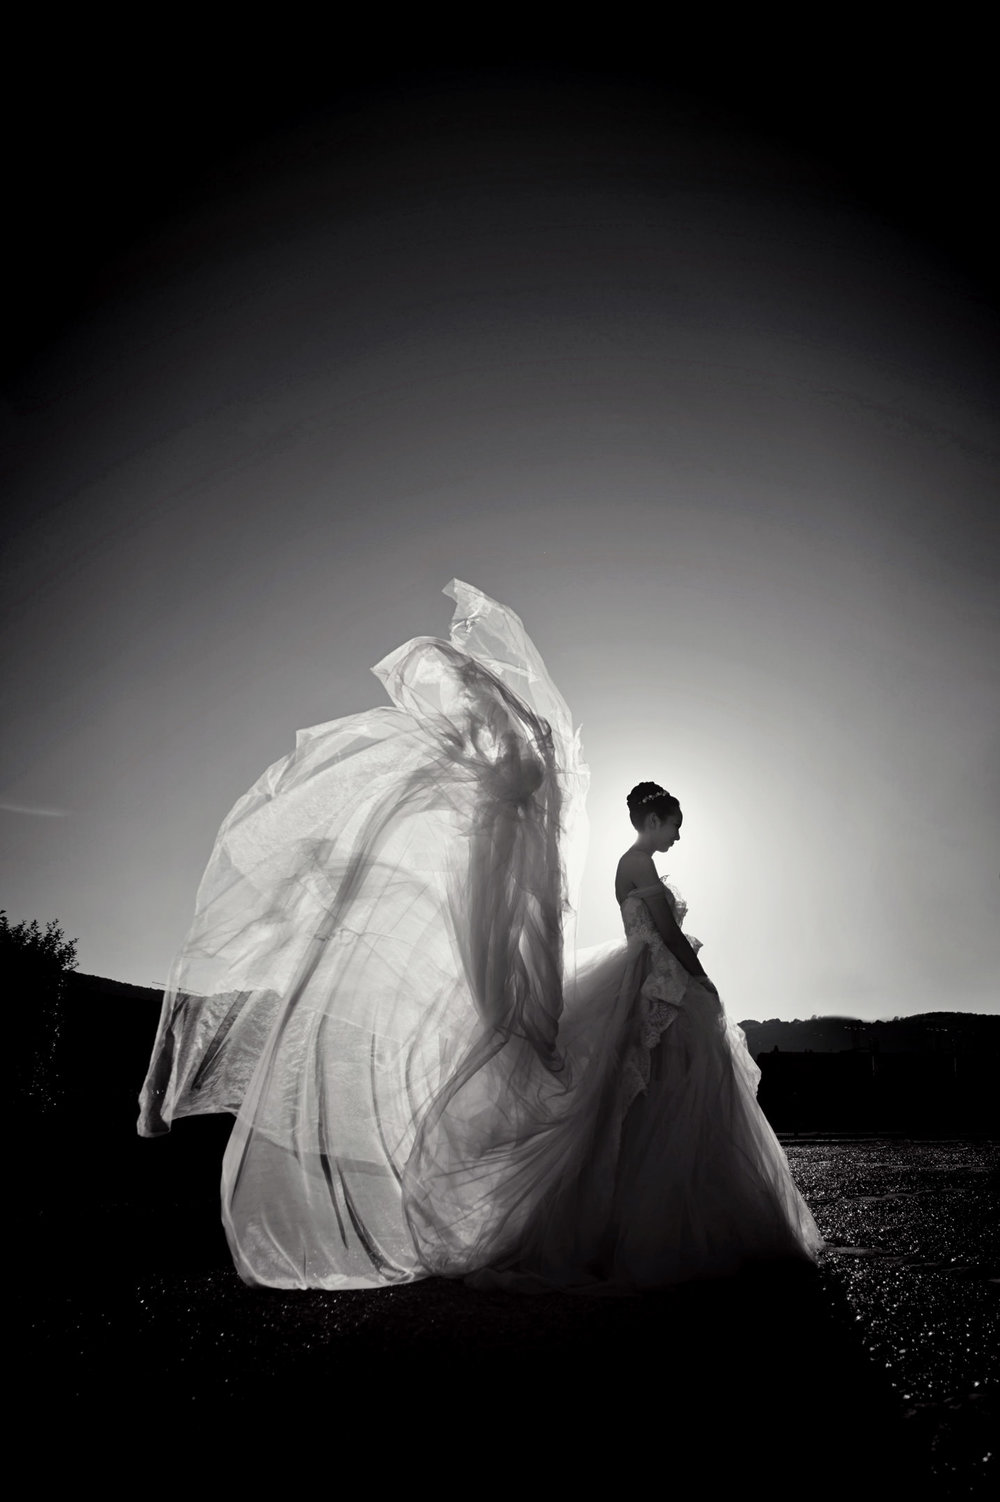 Chris_Hui_婚禮_婚紗照_pre_wedding_photography_best_048_.jpg